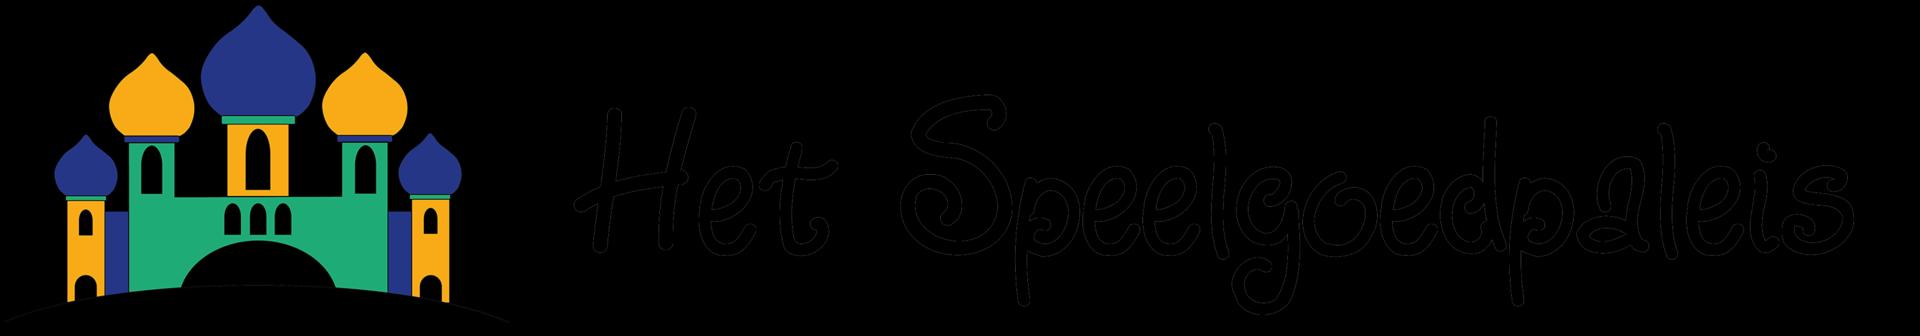 logo Speelgoedpaleis